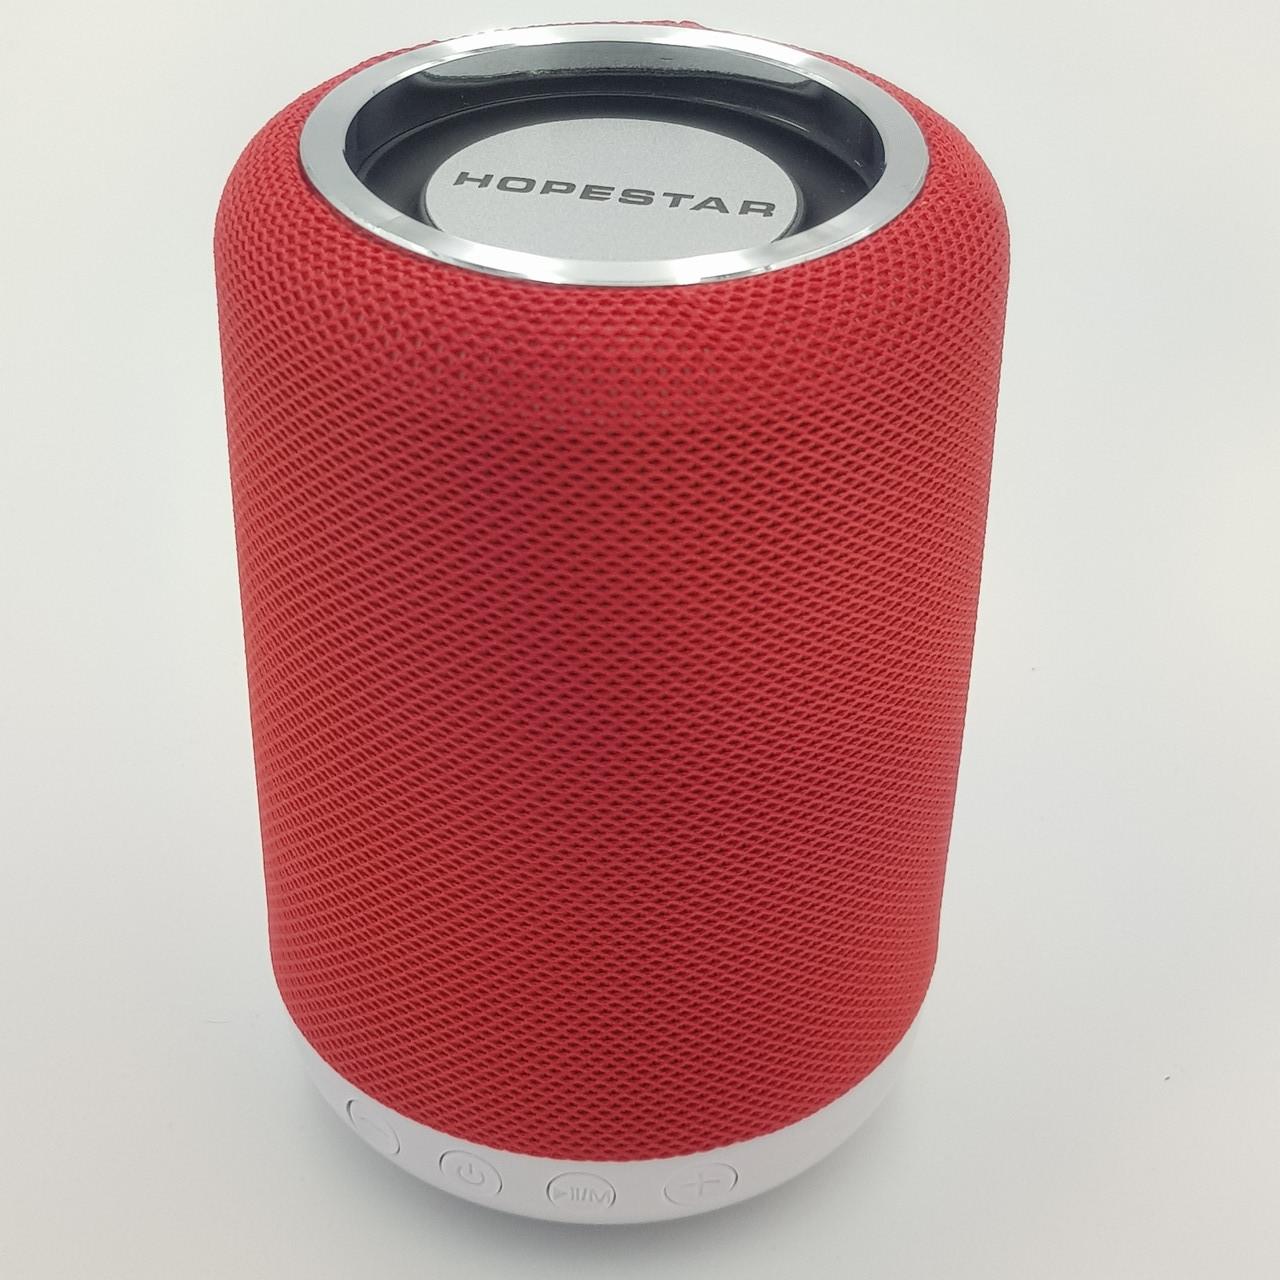 Беспроводная аккумуляторная колонка Bluetooth акустика FM MP3 AUX USB Hopestar H34 красная